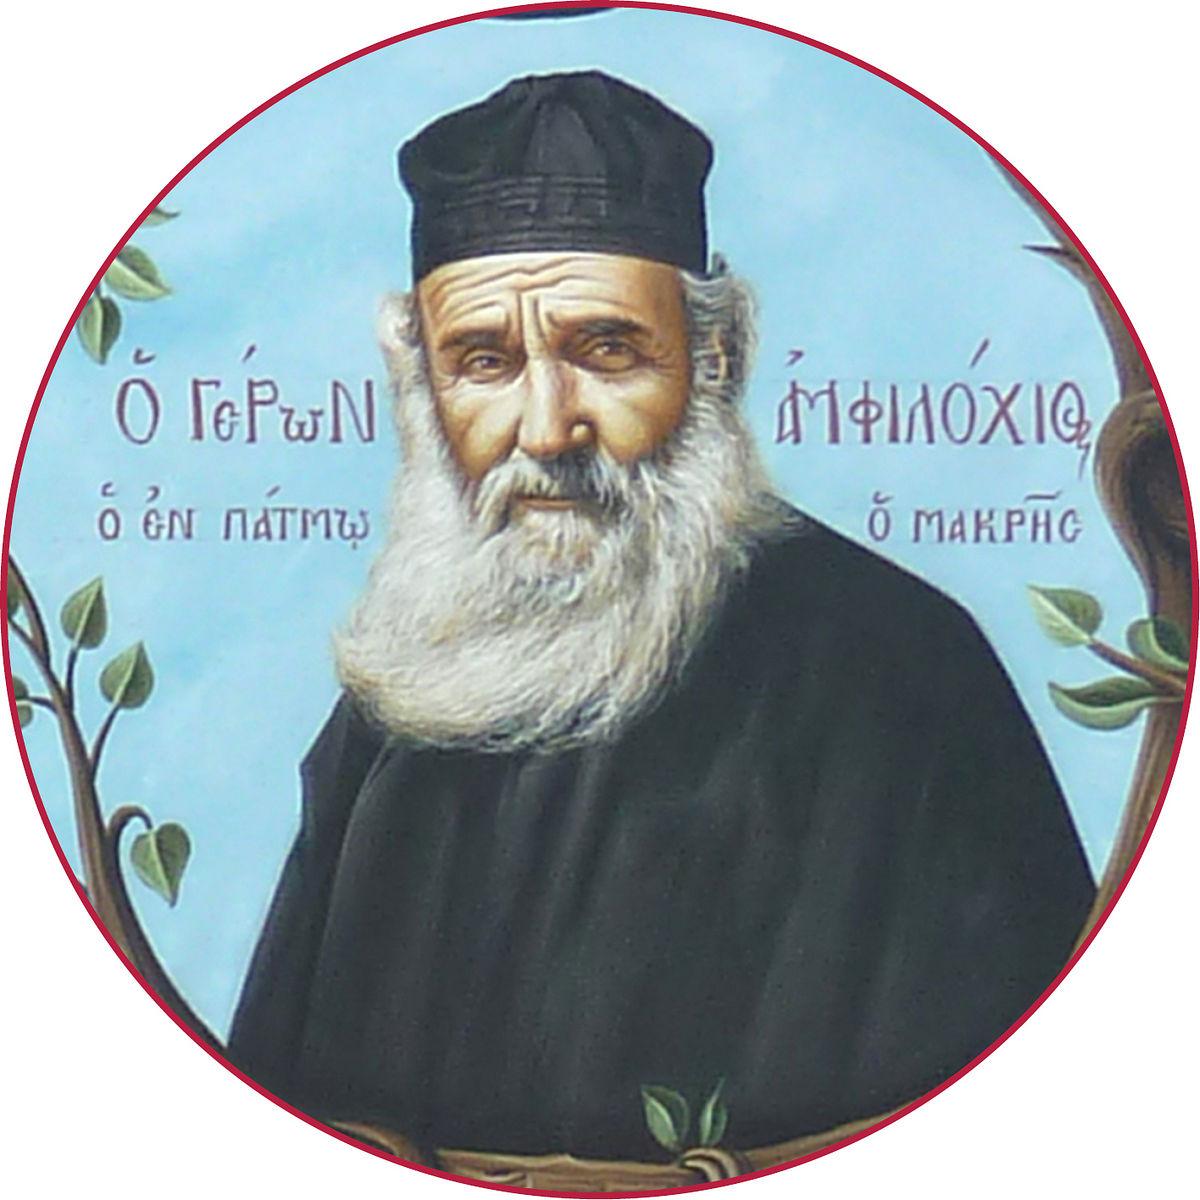 Духовные заветы старца Амфилохия (Макриса)